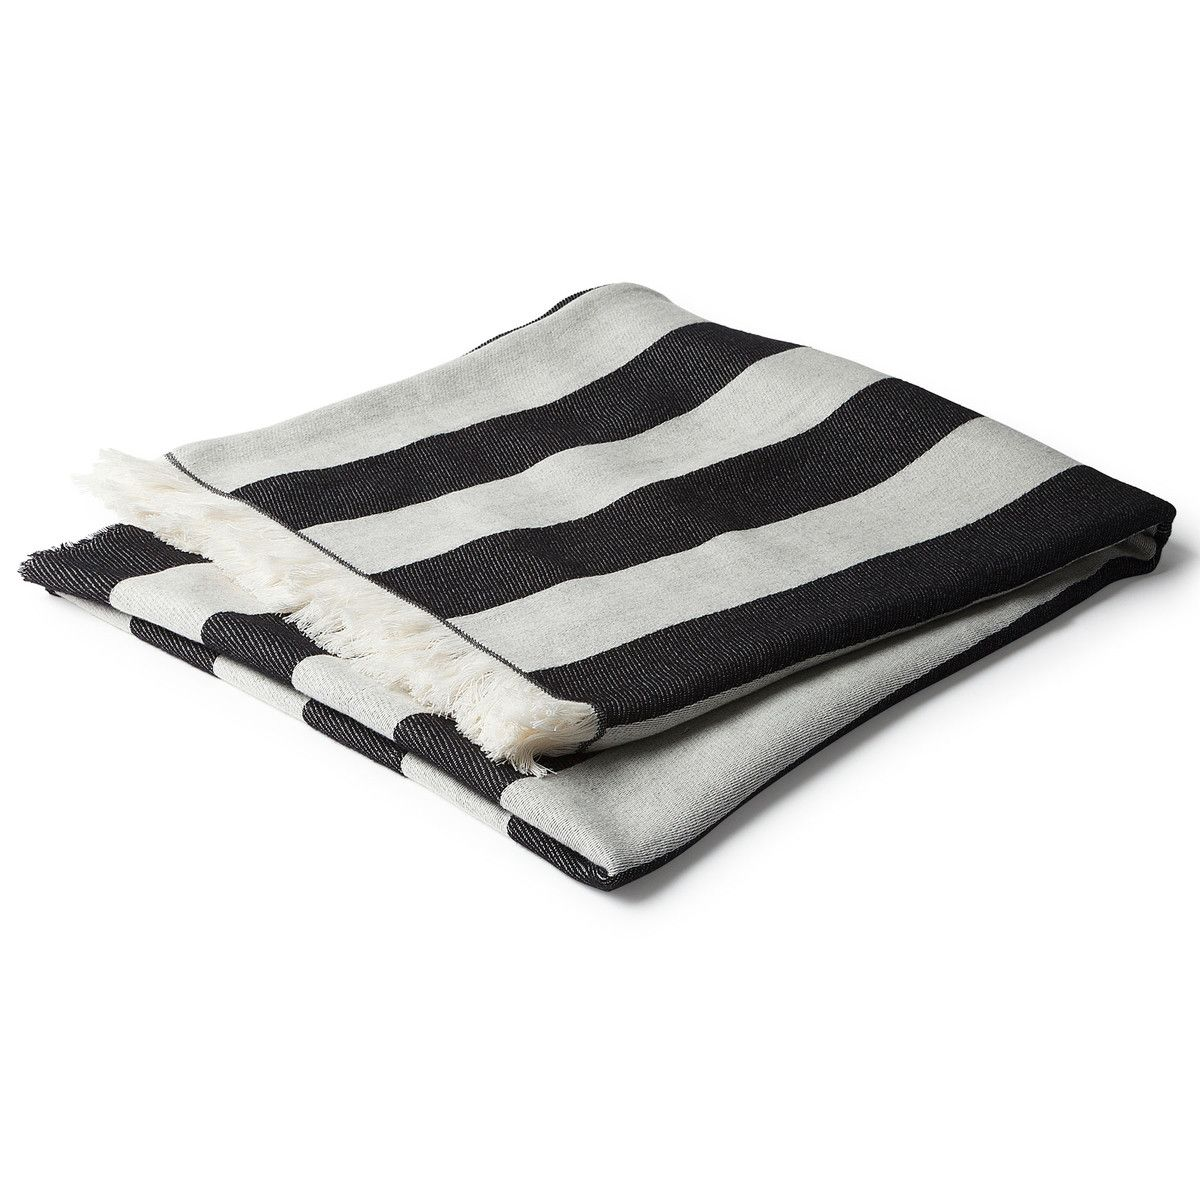 marimekko korsi decke inside pinterest marimekko deckchen und wolldecke. Black Bedroom Furniture Sets. Home Design Ideas